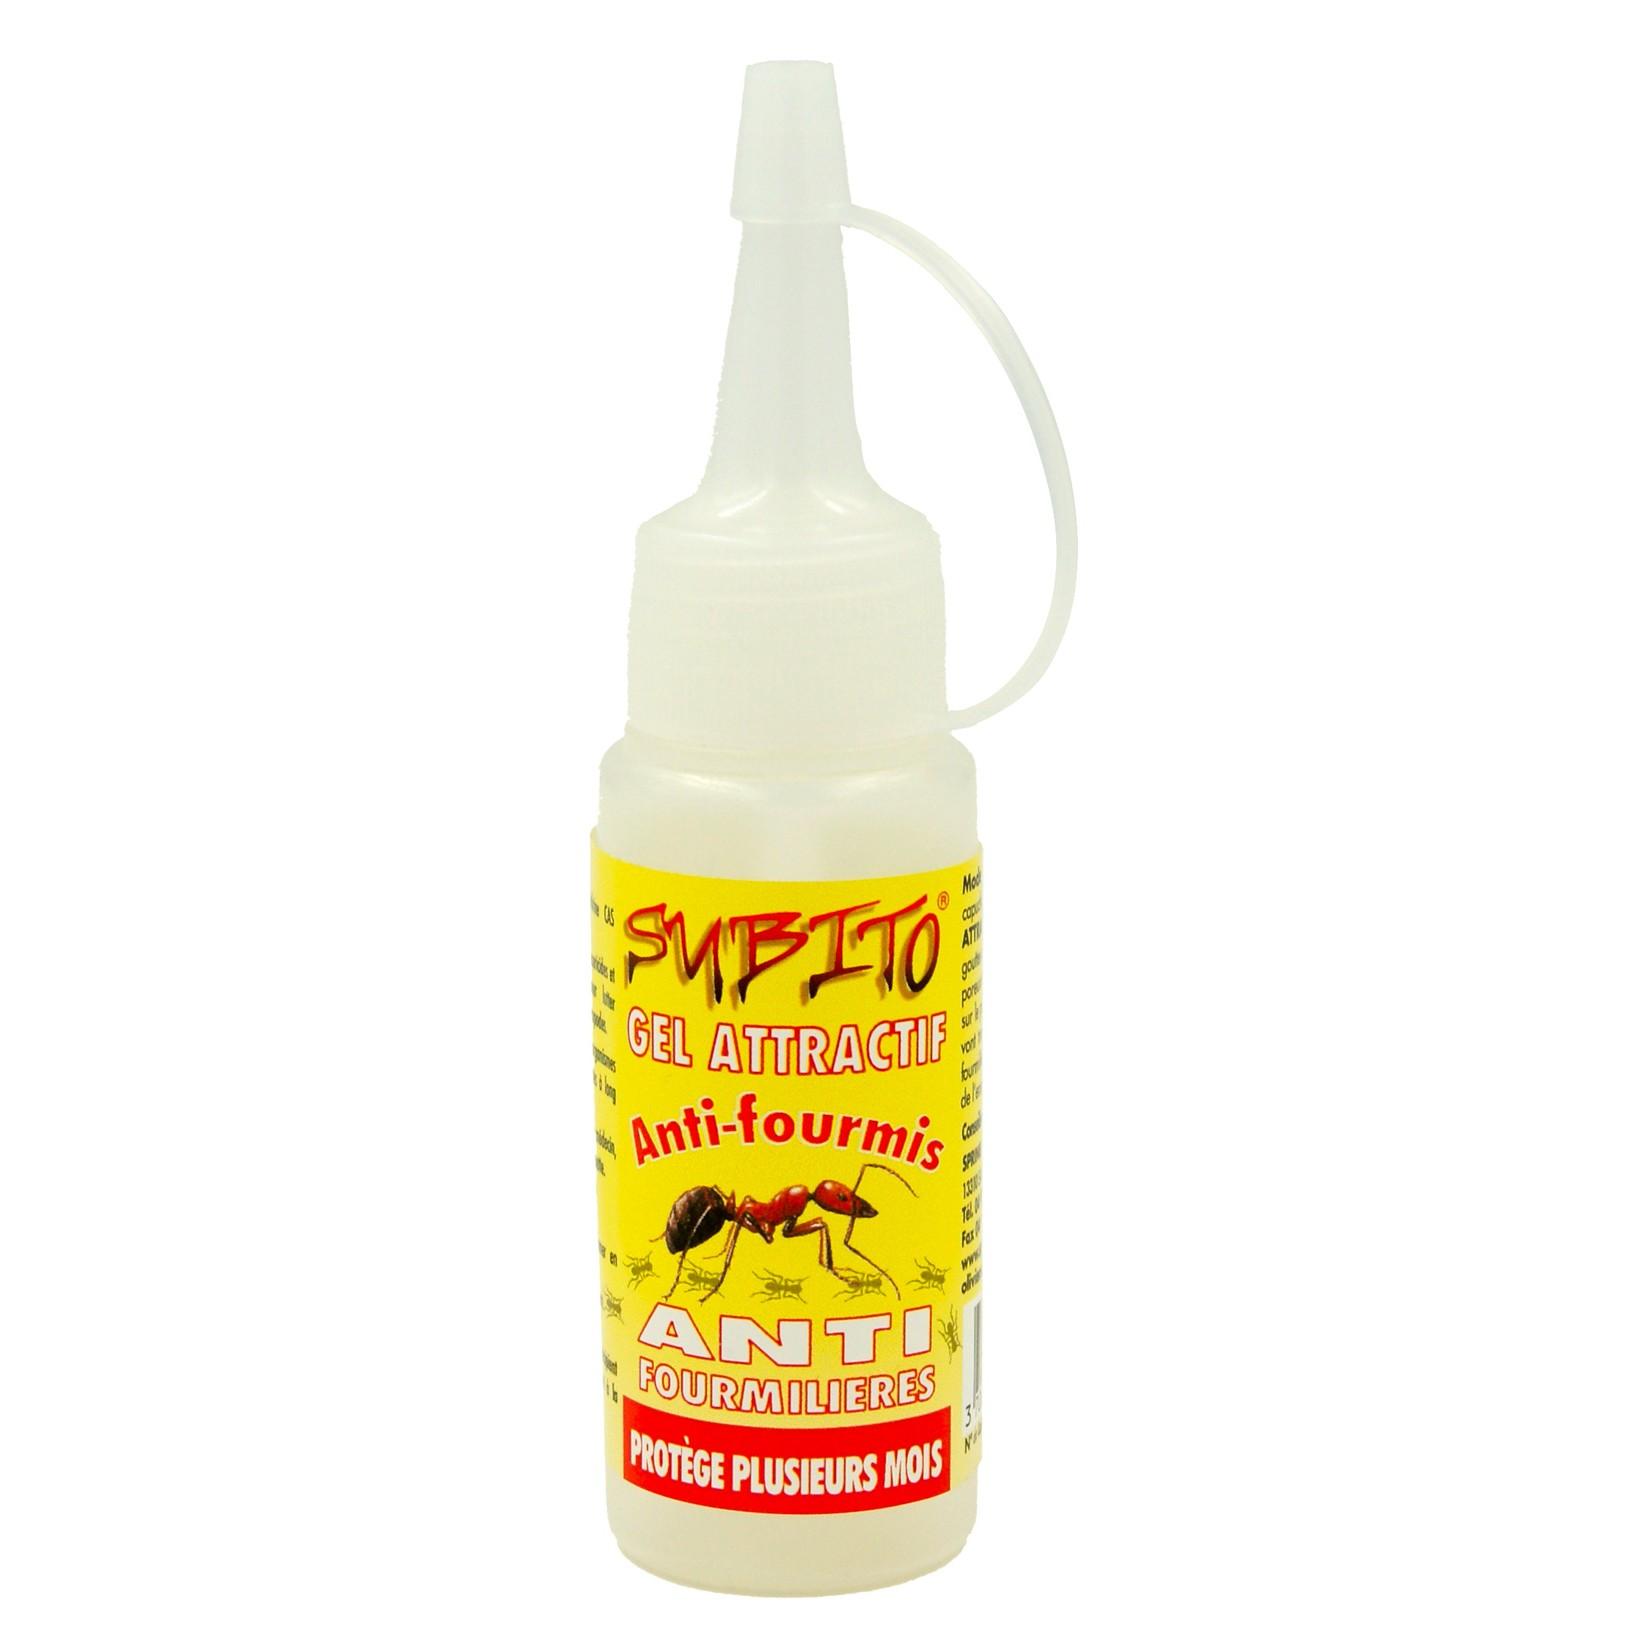 Gel attractif insecticide anti-fourmis et anti-fourmilières 65g Subito   Insecticide Antinuisible Qualité Professionnelle